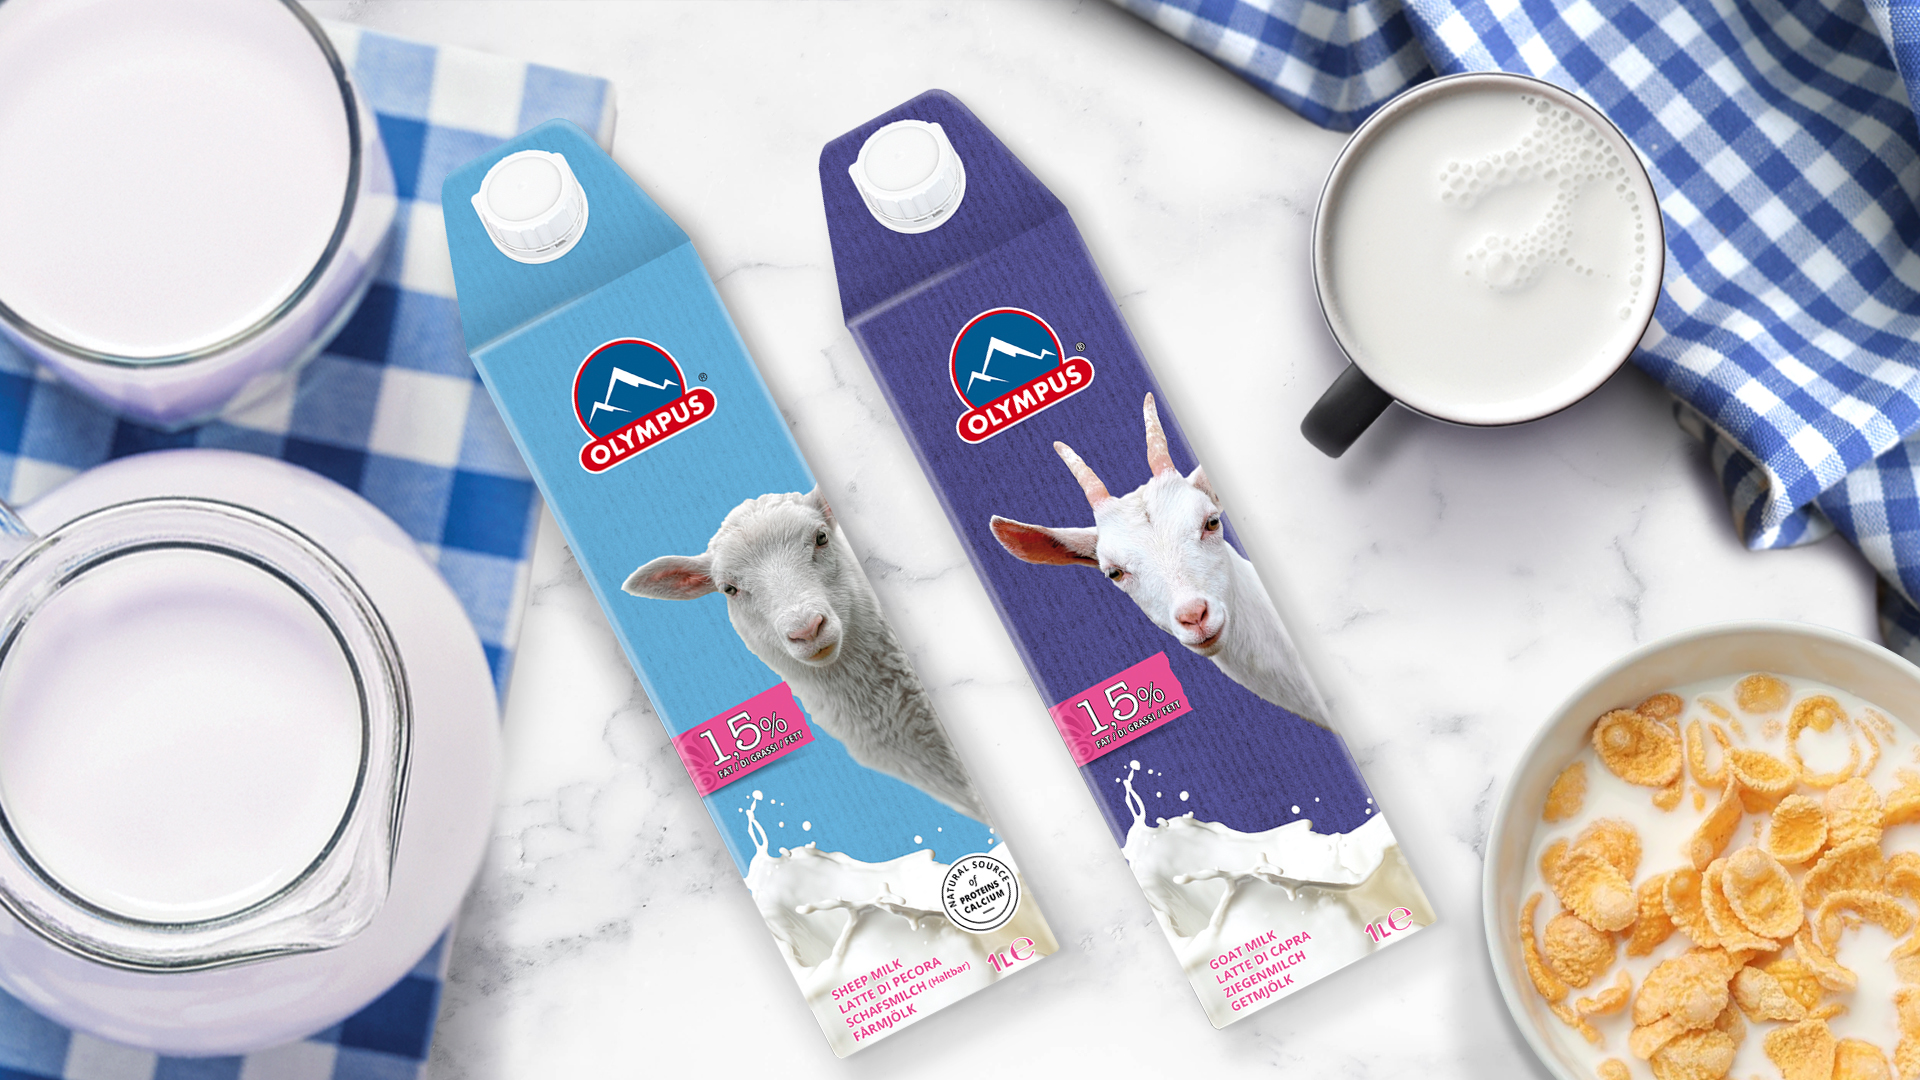 Image Milk